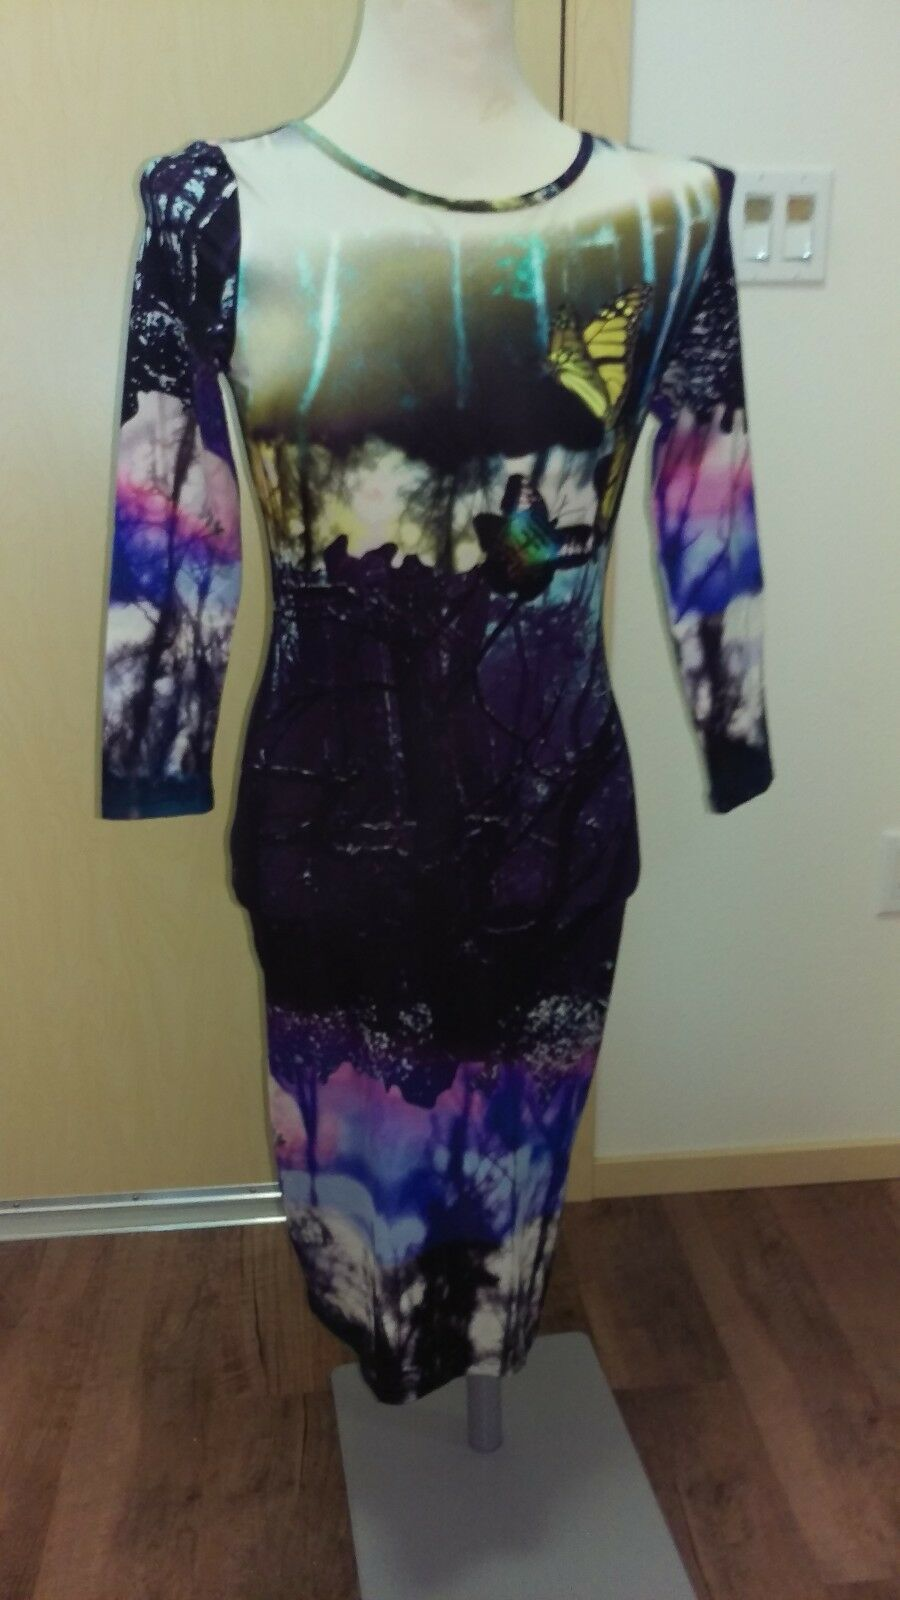 NEW TOPSHOP Bodycon Long Sleeve Butterfly Print Sheath Dress US 4